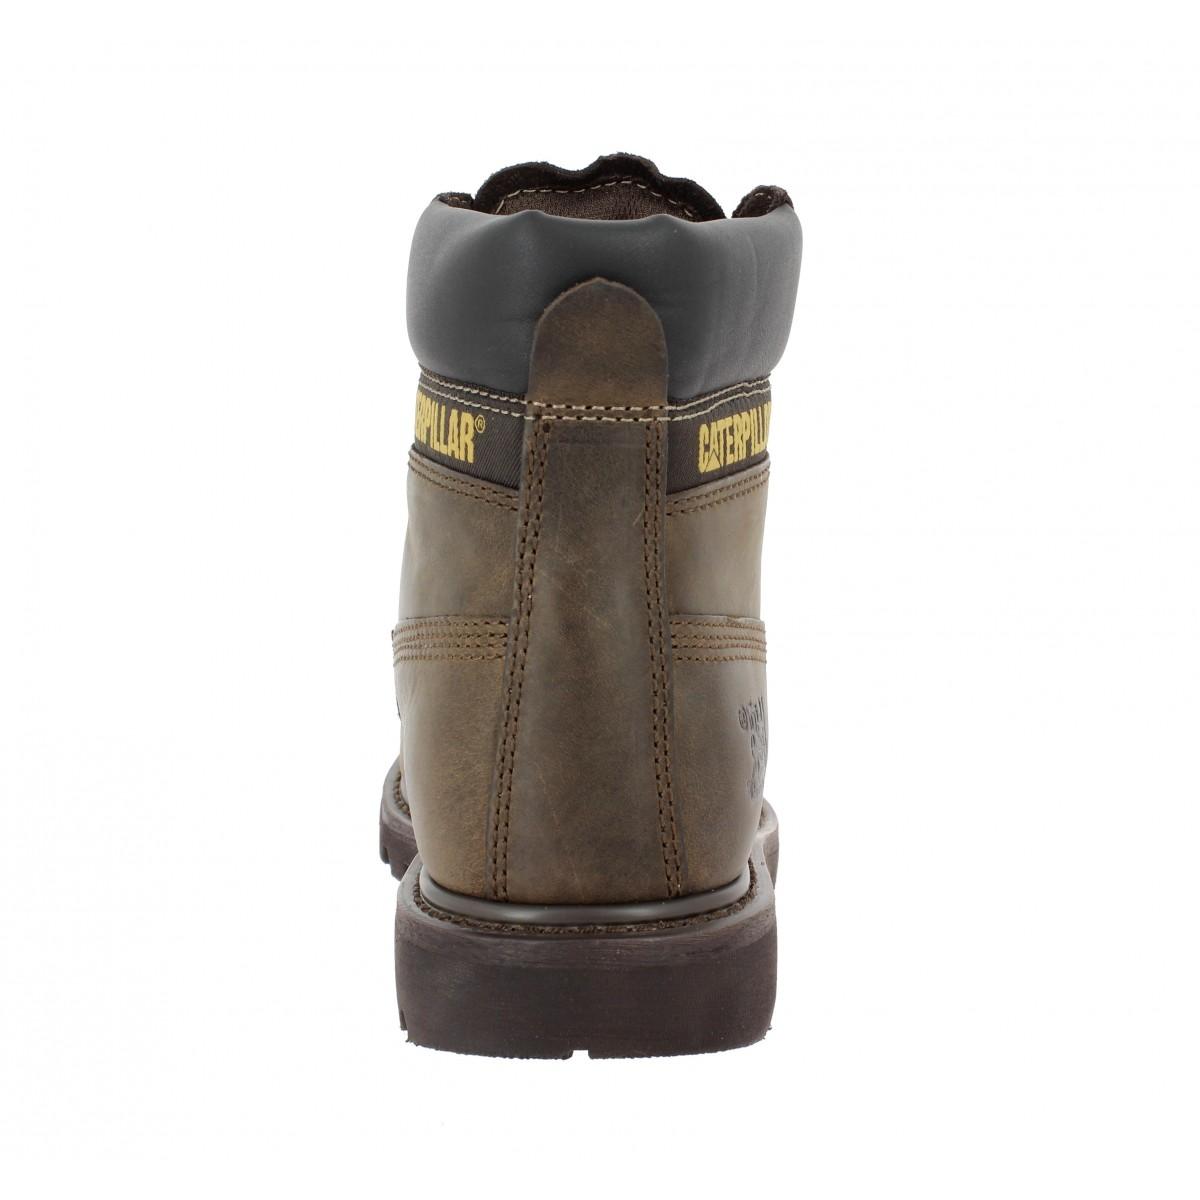 da2064b5c83328 Caterpillar colorado cuir homme chocolat | Fanny chaussures